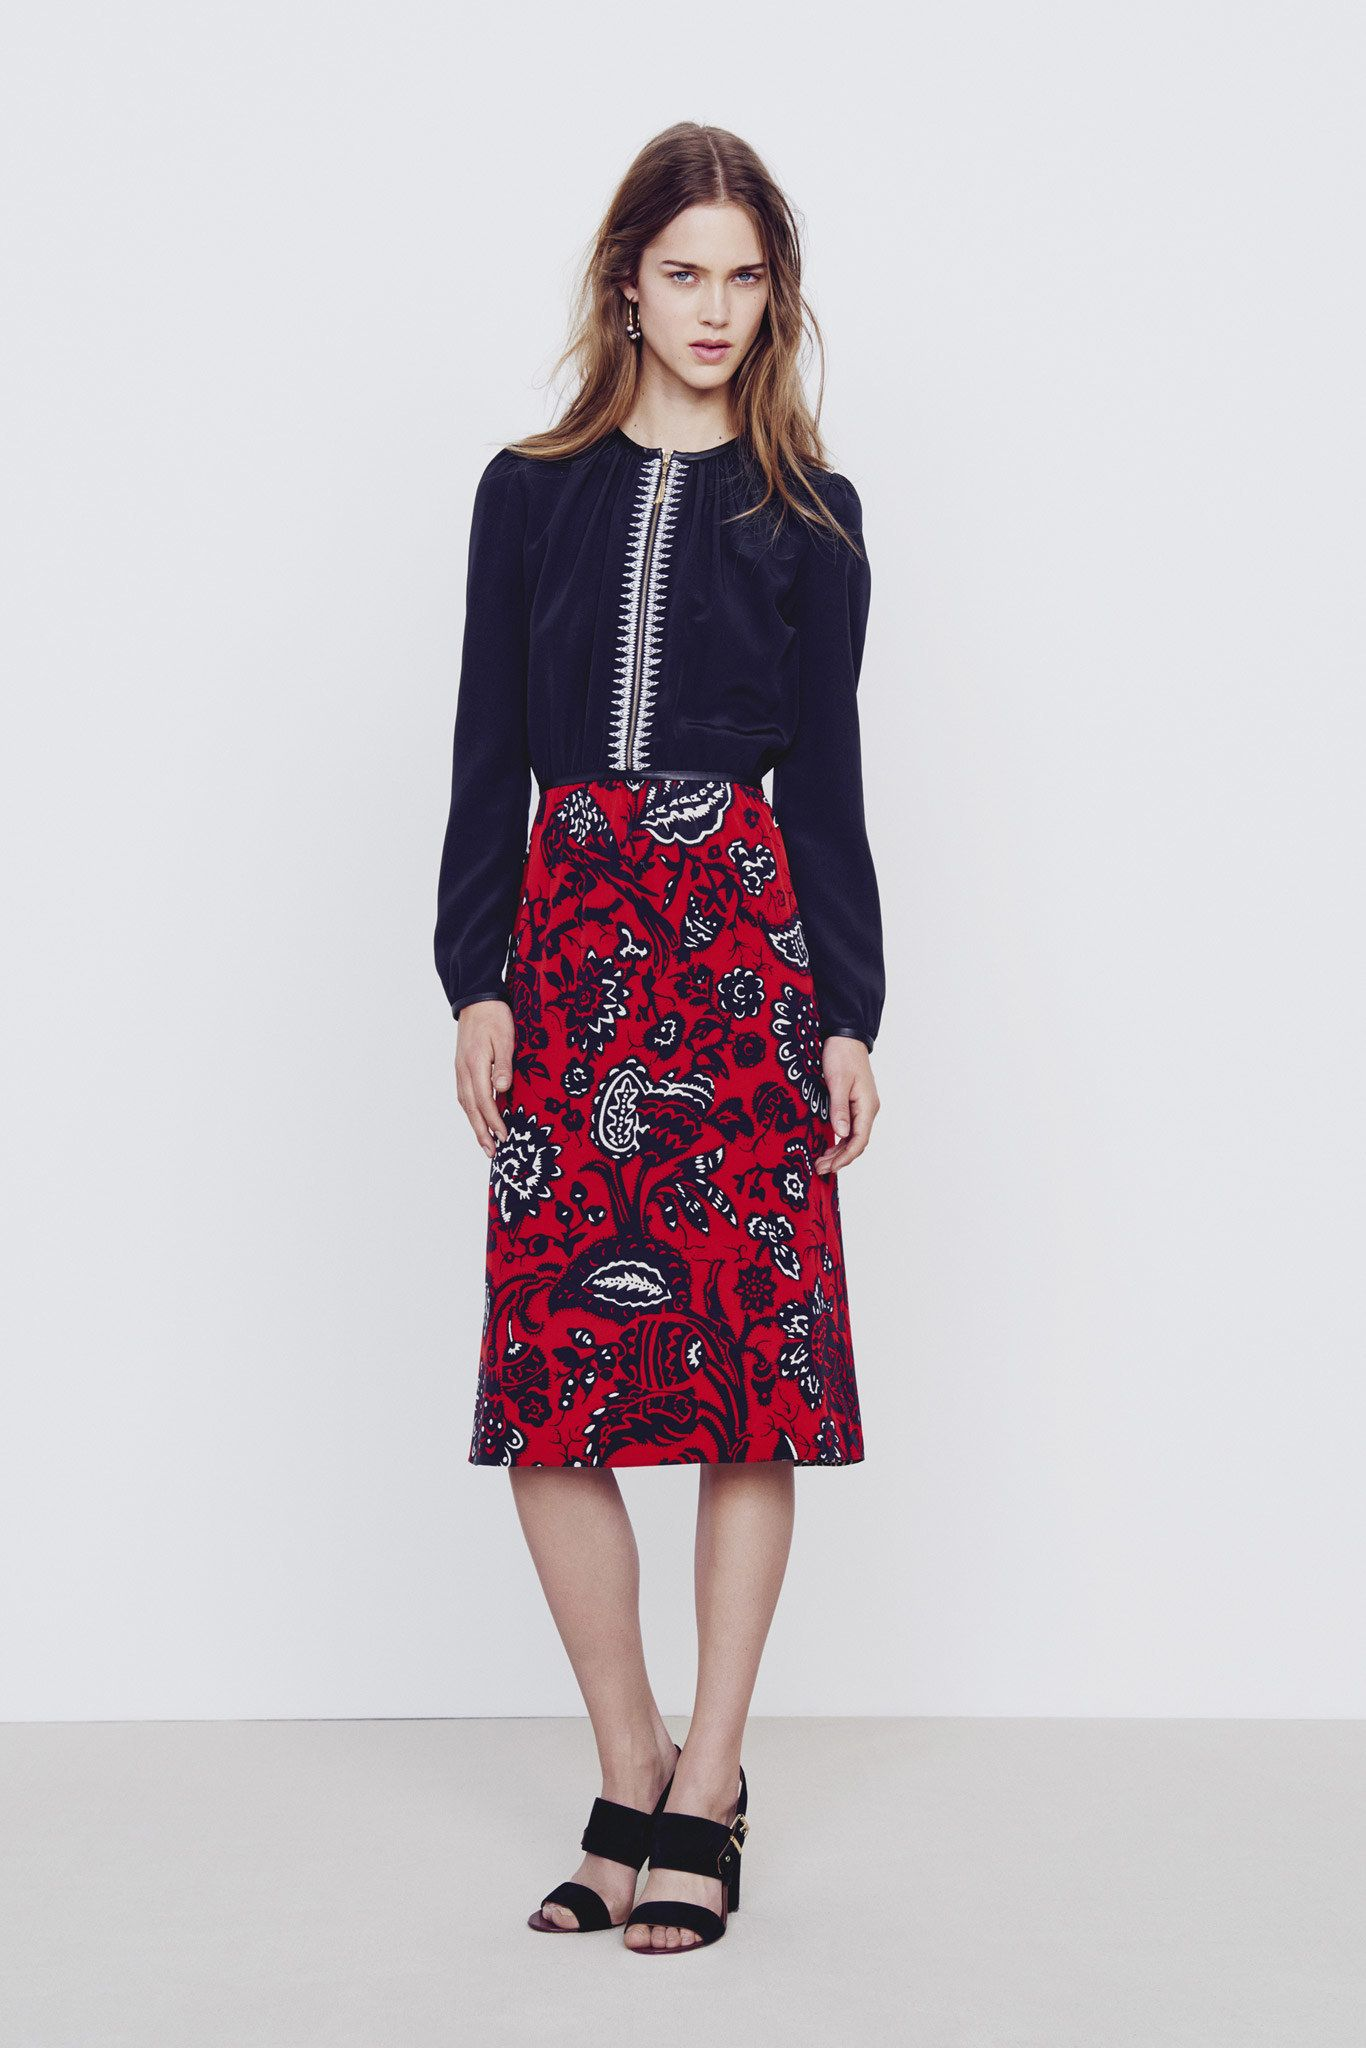 Vanessa Bruno Fall 2015 Ready-to-Wear Fashion Show